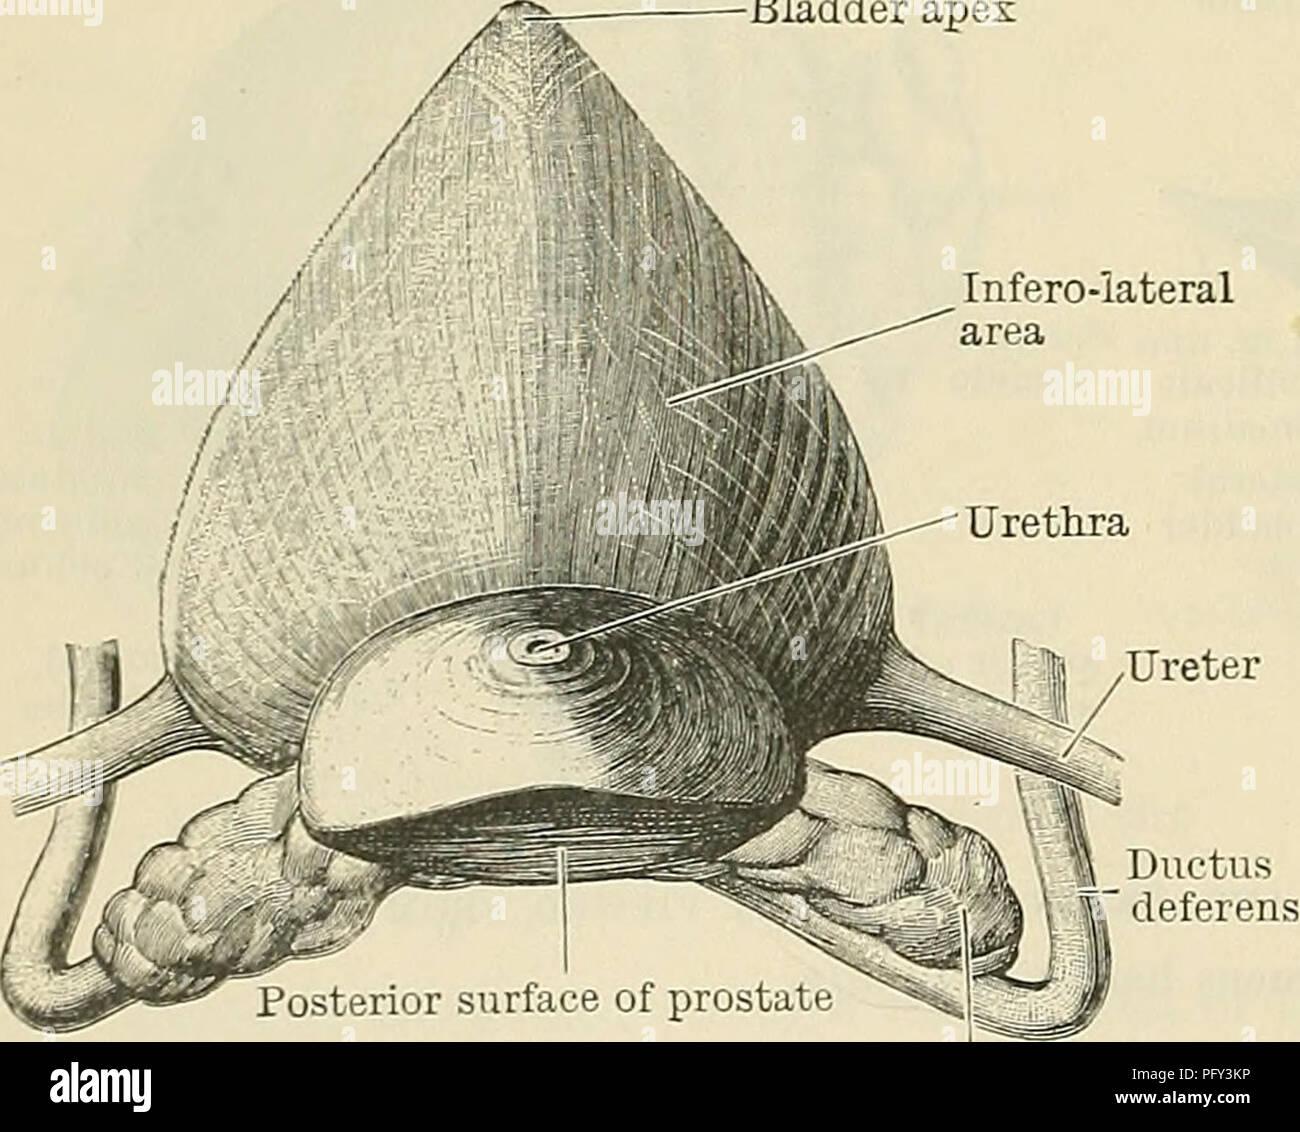 Pelvic Diaphragm Stock Photos & Pelvic Diaphragm Stock Images - Alamy